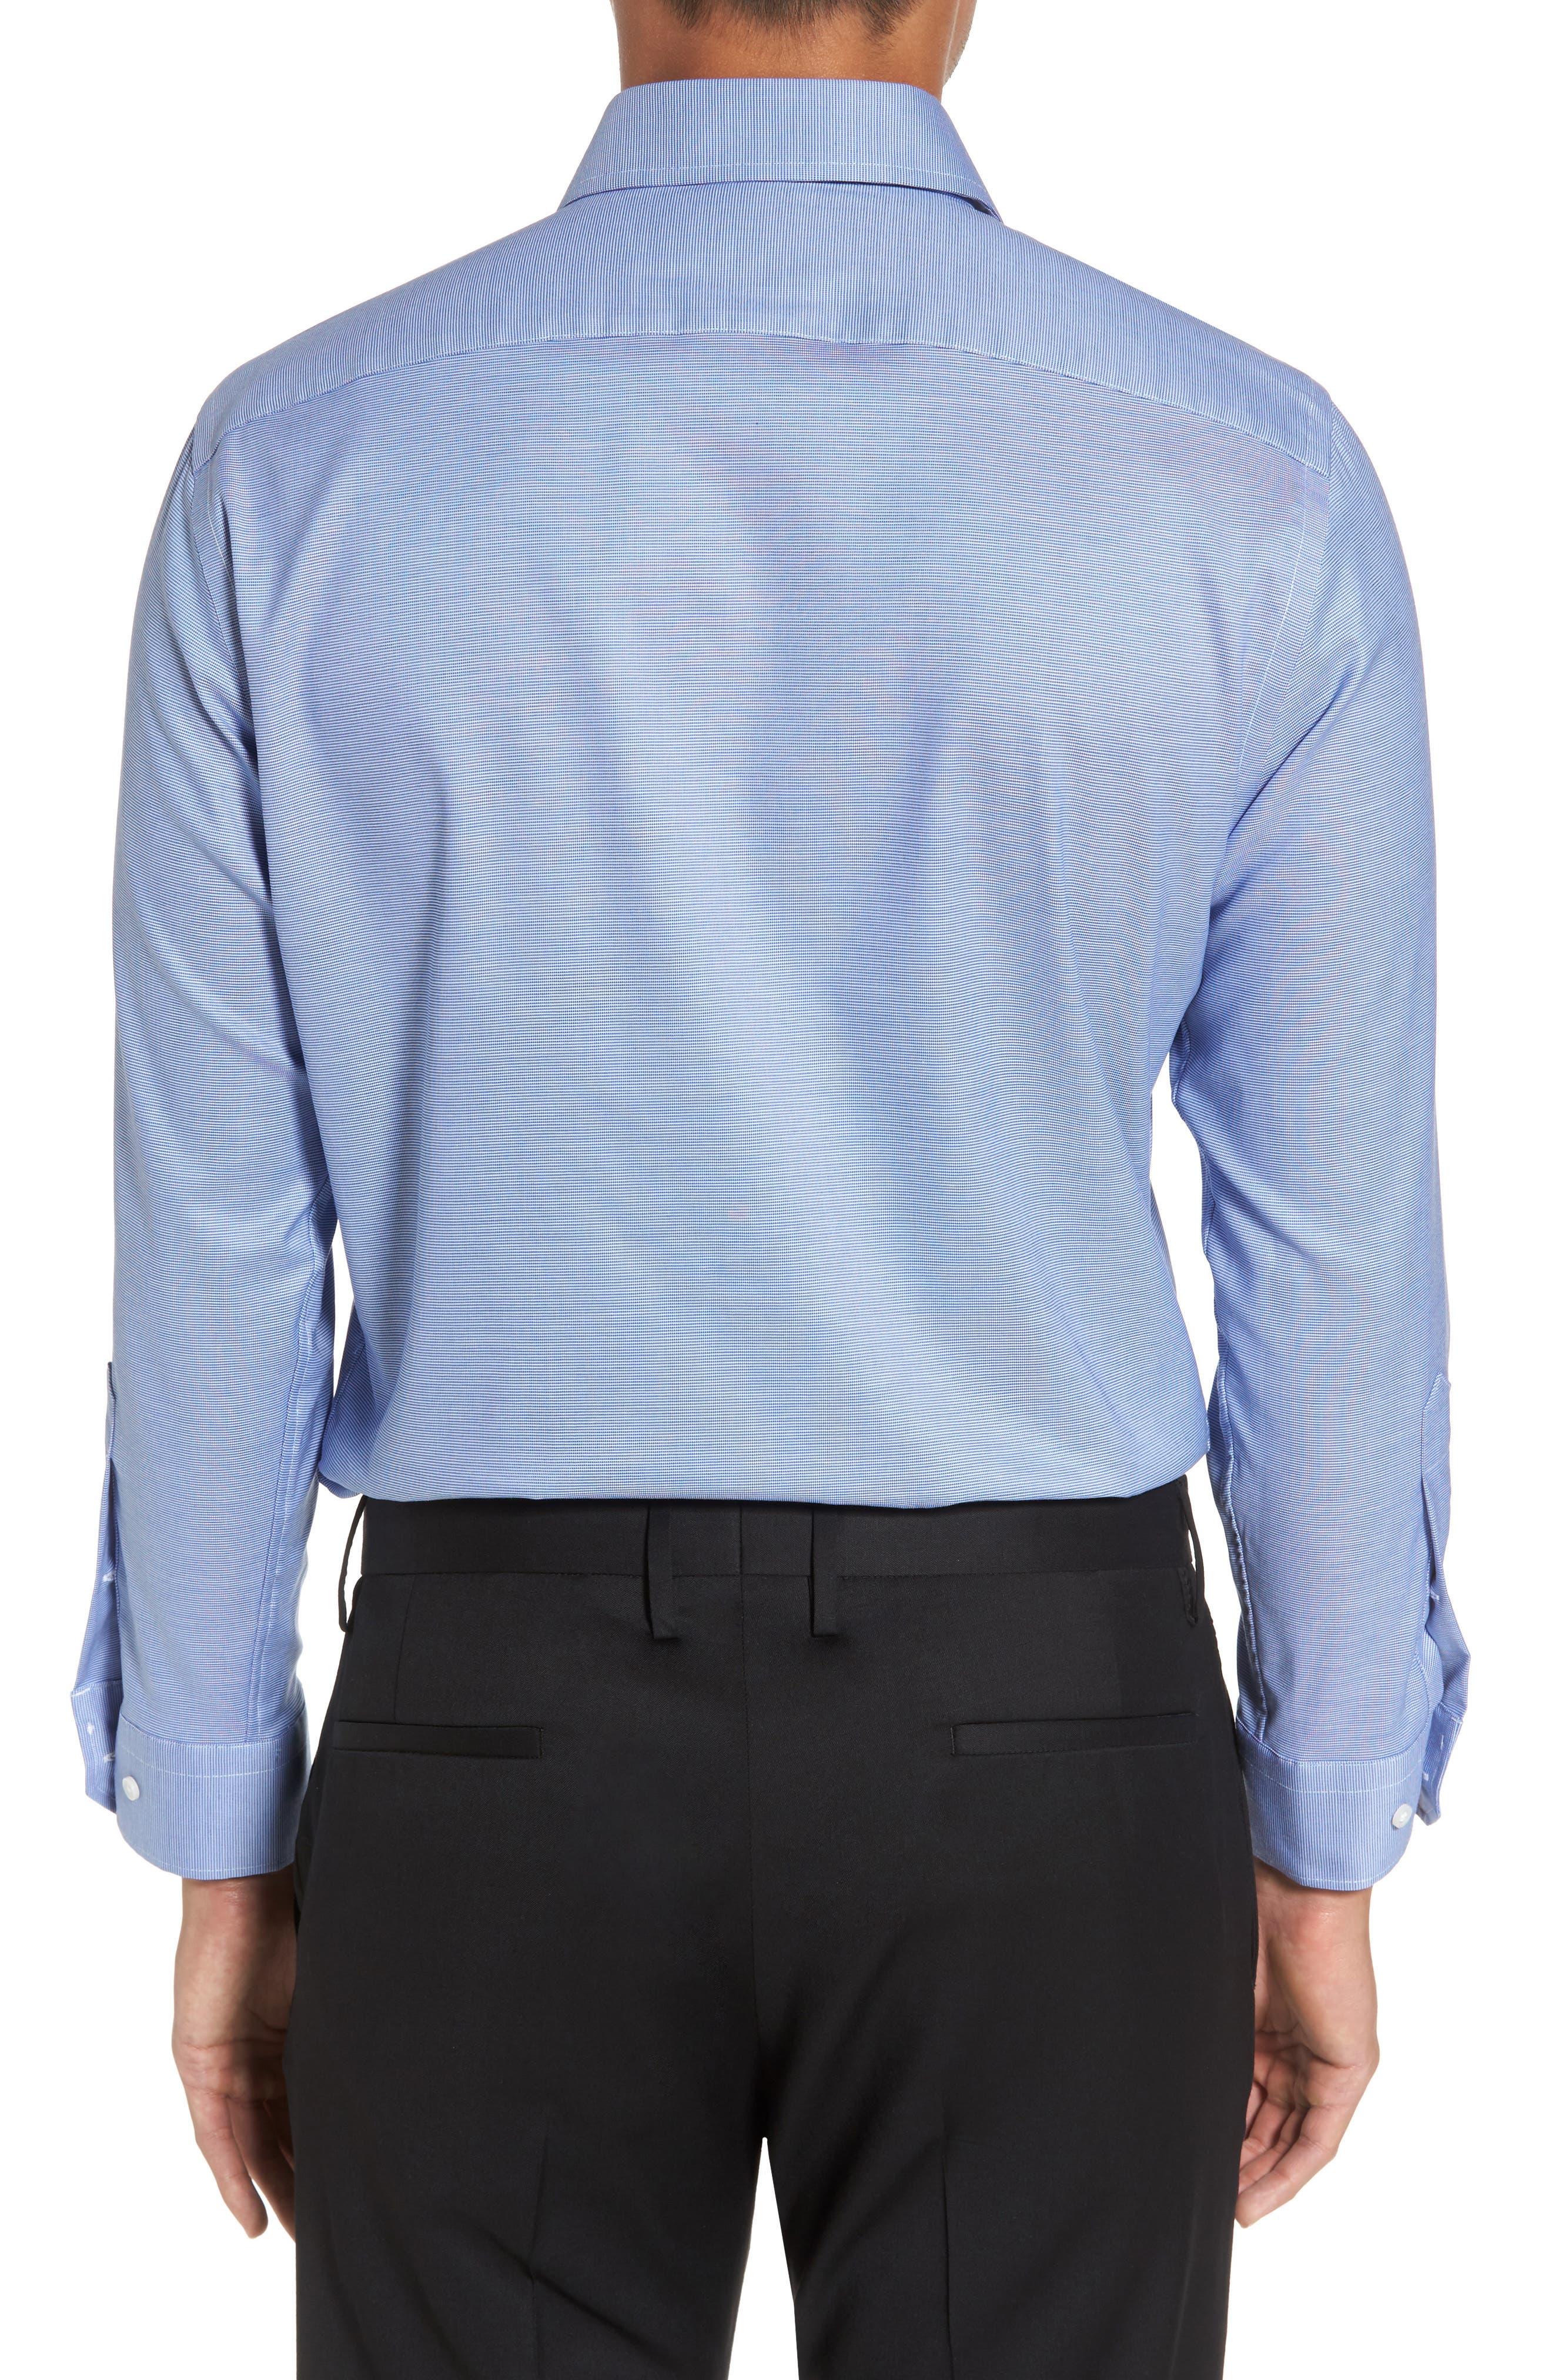 Trim Fit Non-Iron Dress Shirt,                             Alternate thumbnail 2, color,                             Blue Sodalite